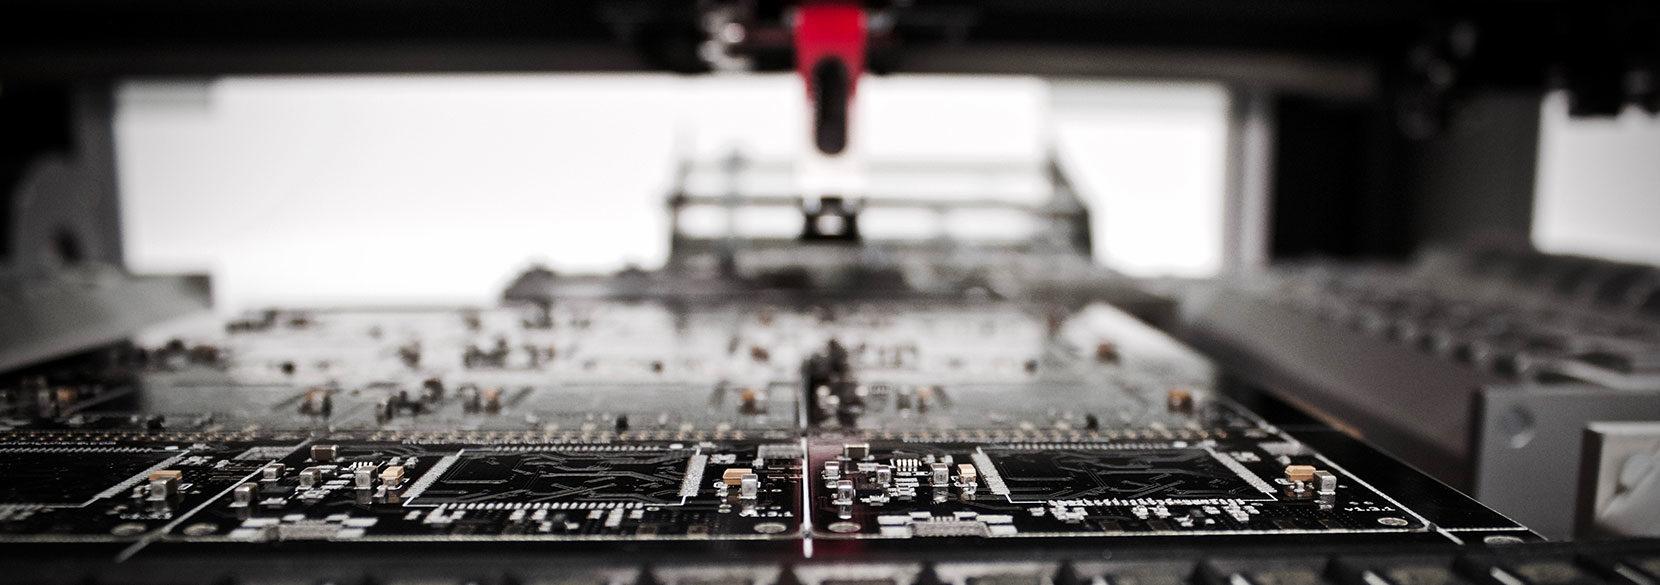 Informationstechnik – Electrosuisse